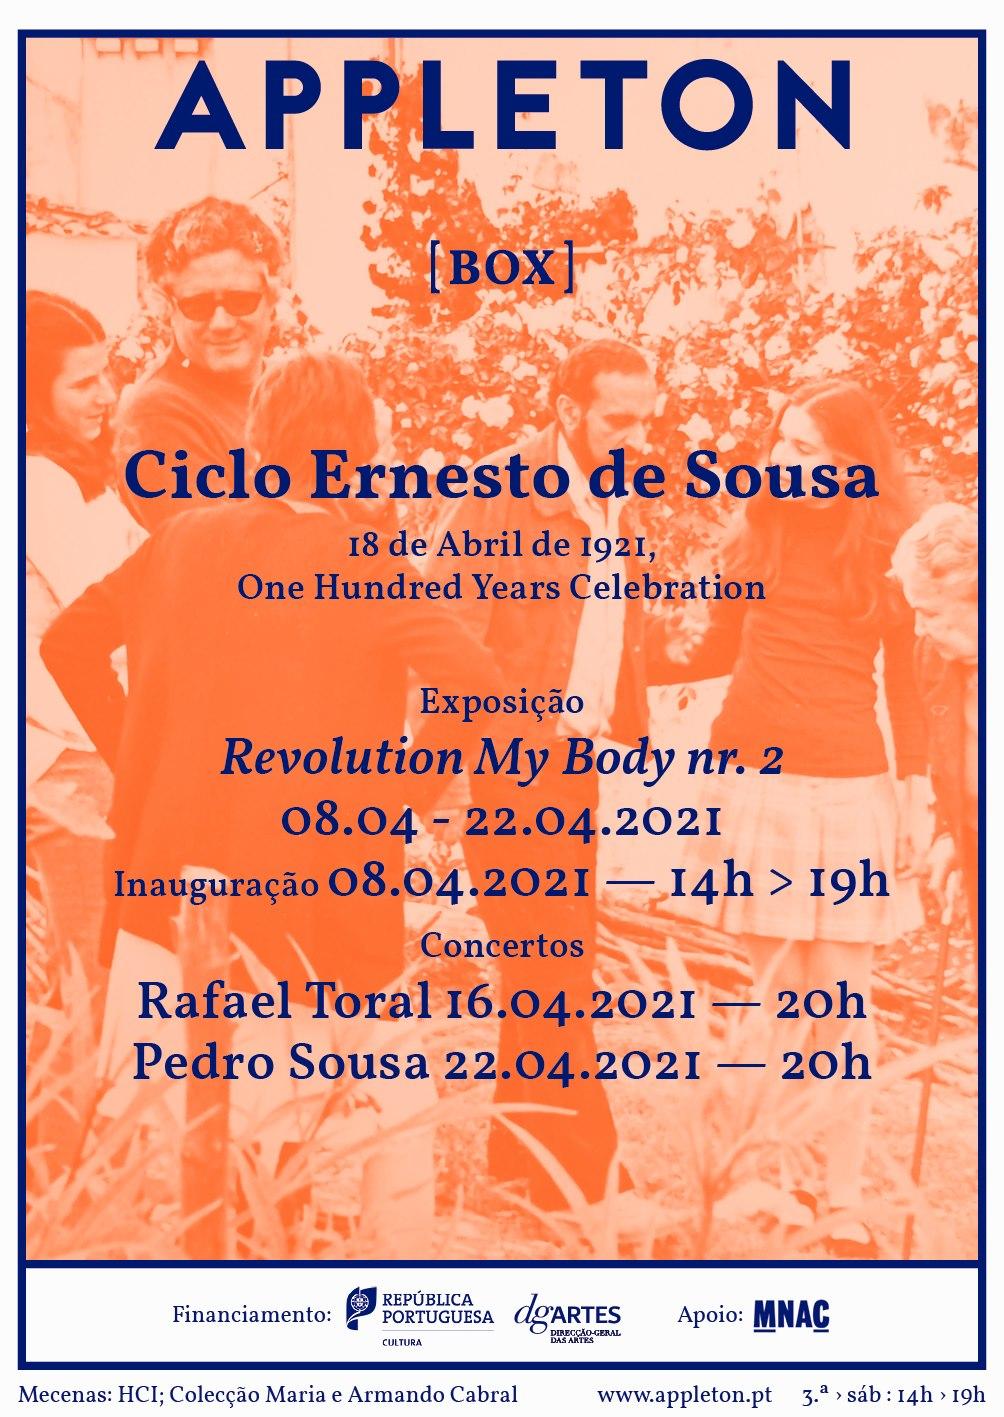 Appleton - Box | Ciclo Ernesto Sousa